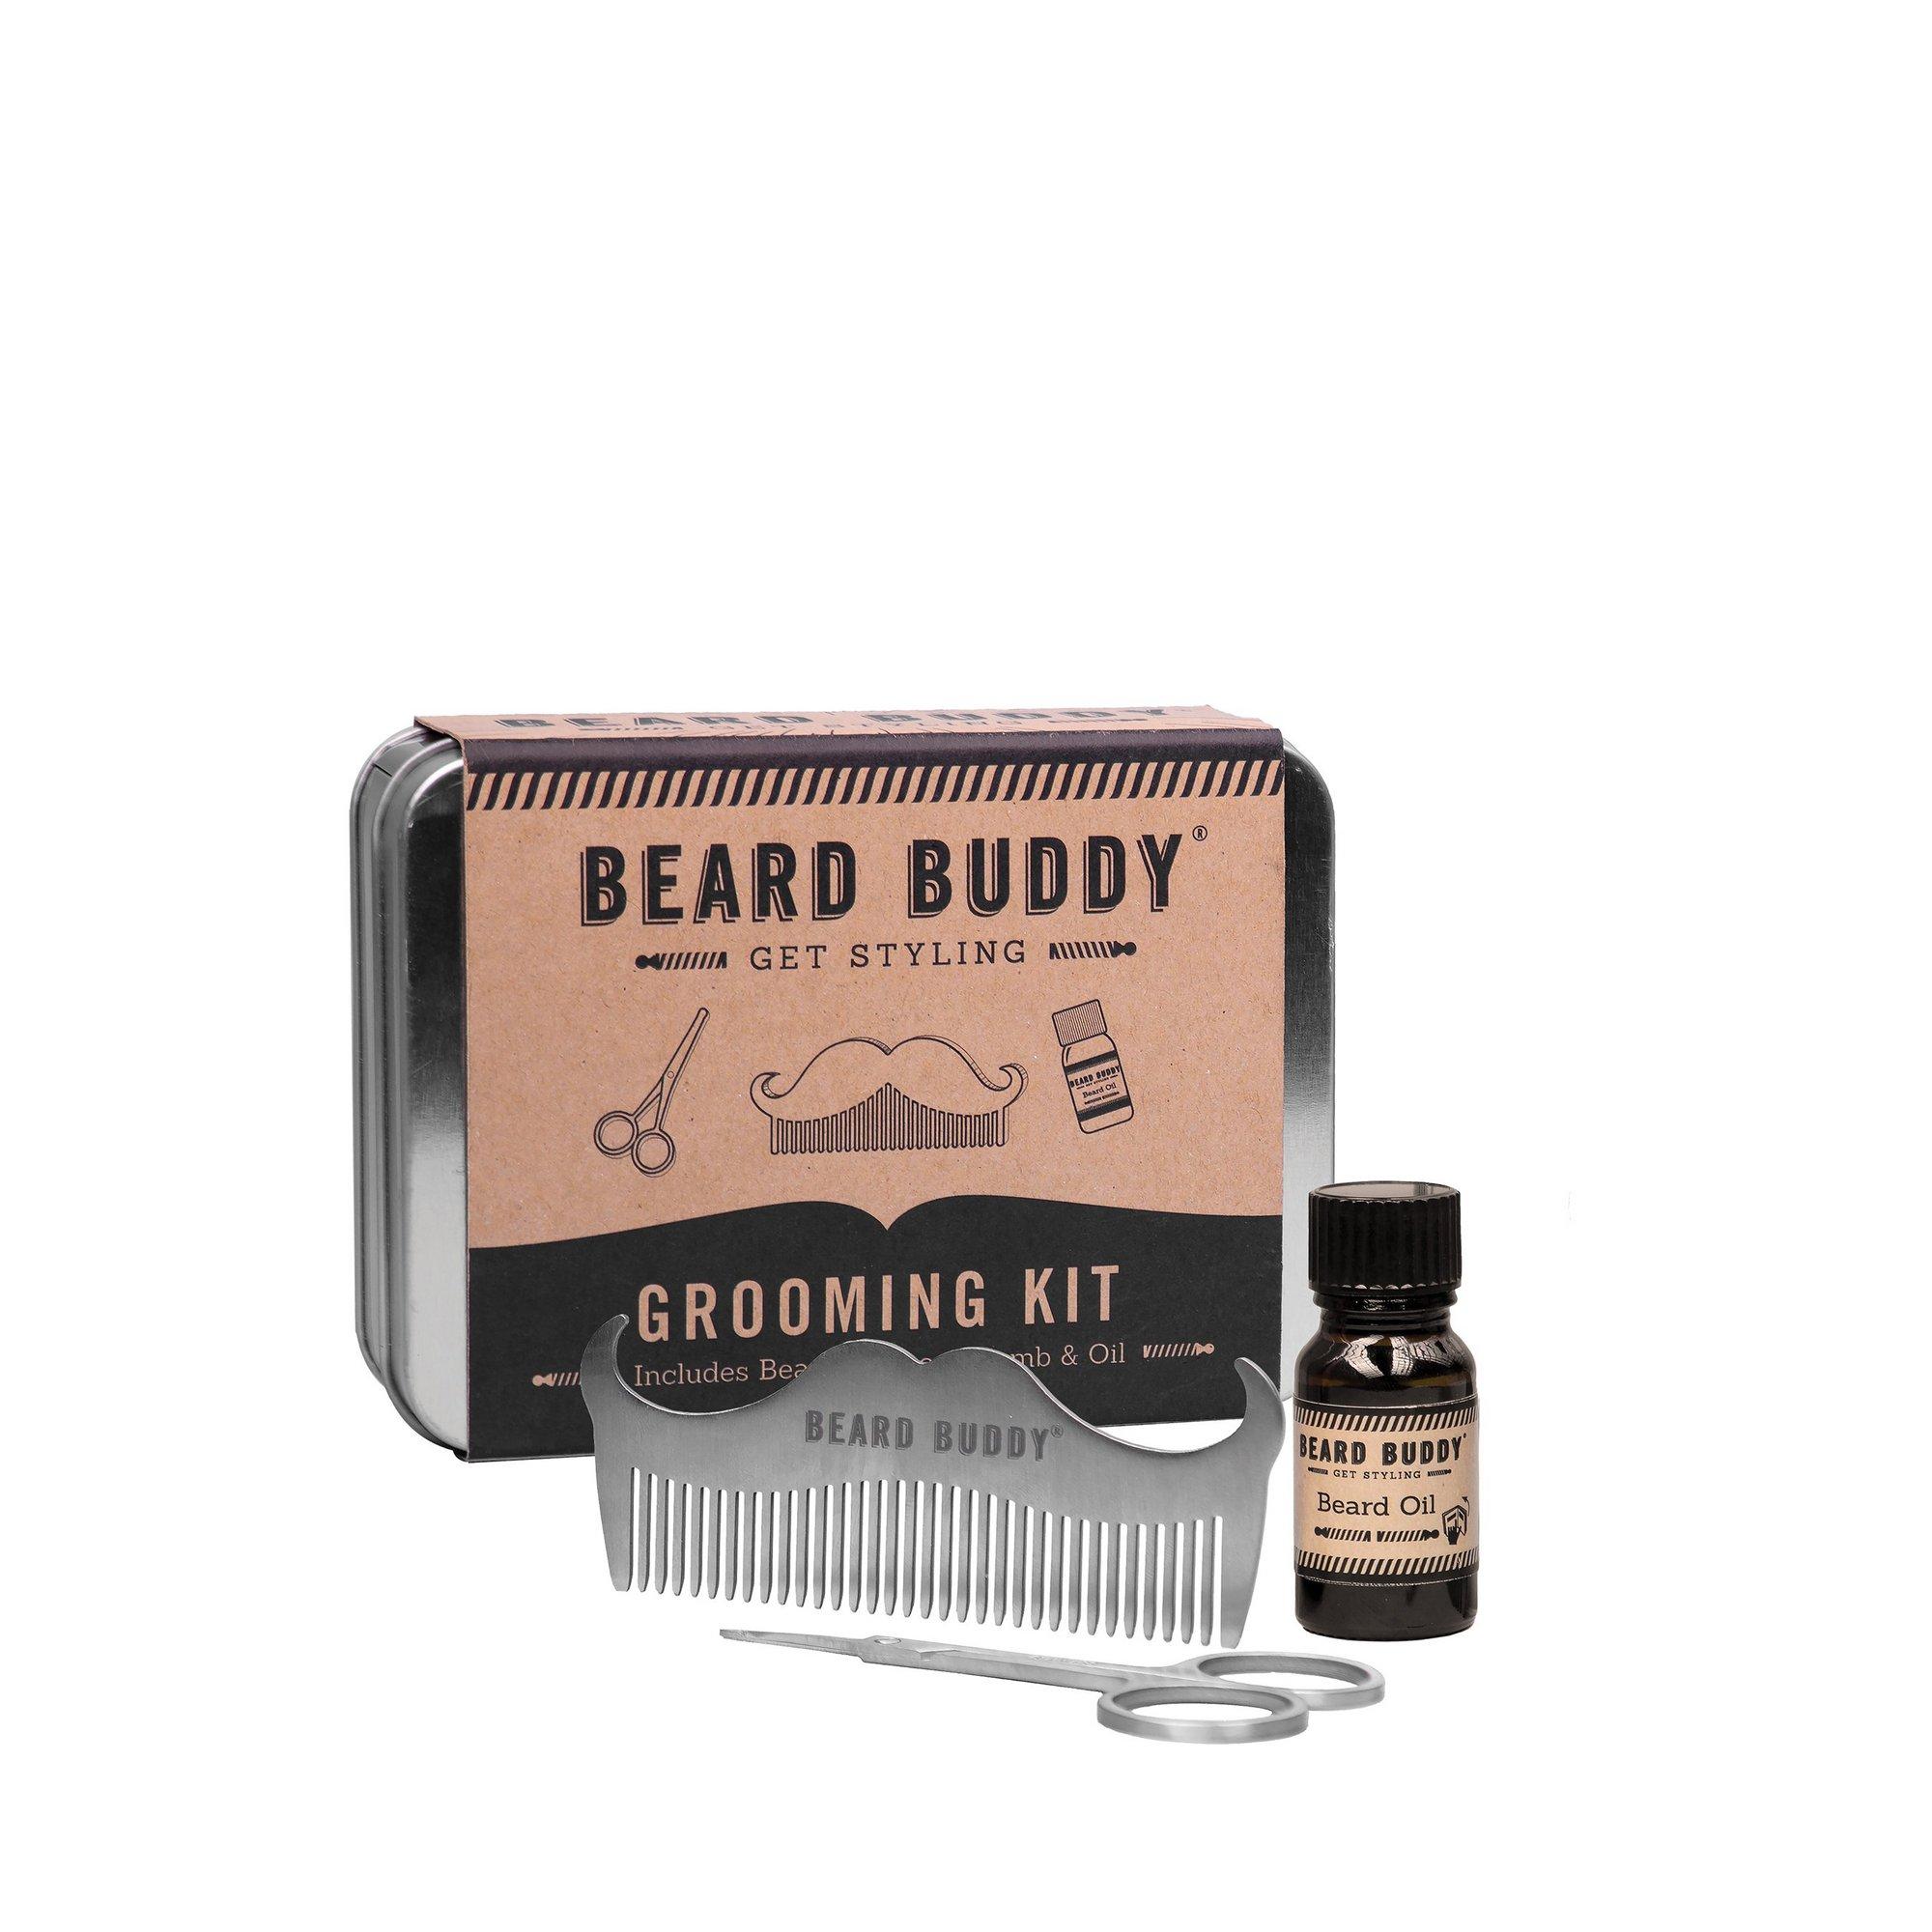 Image of Beard Buddy Grooming Kit